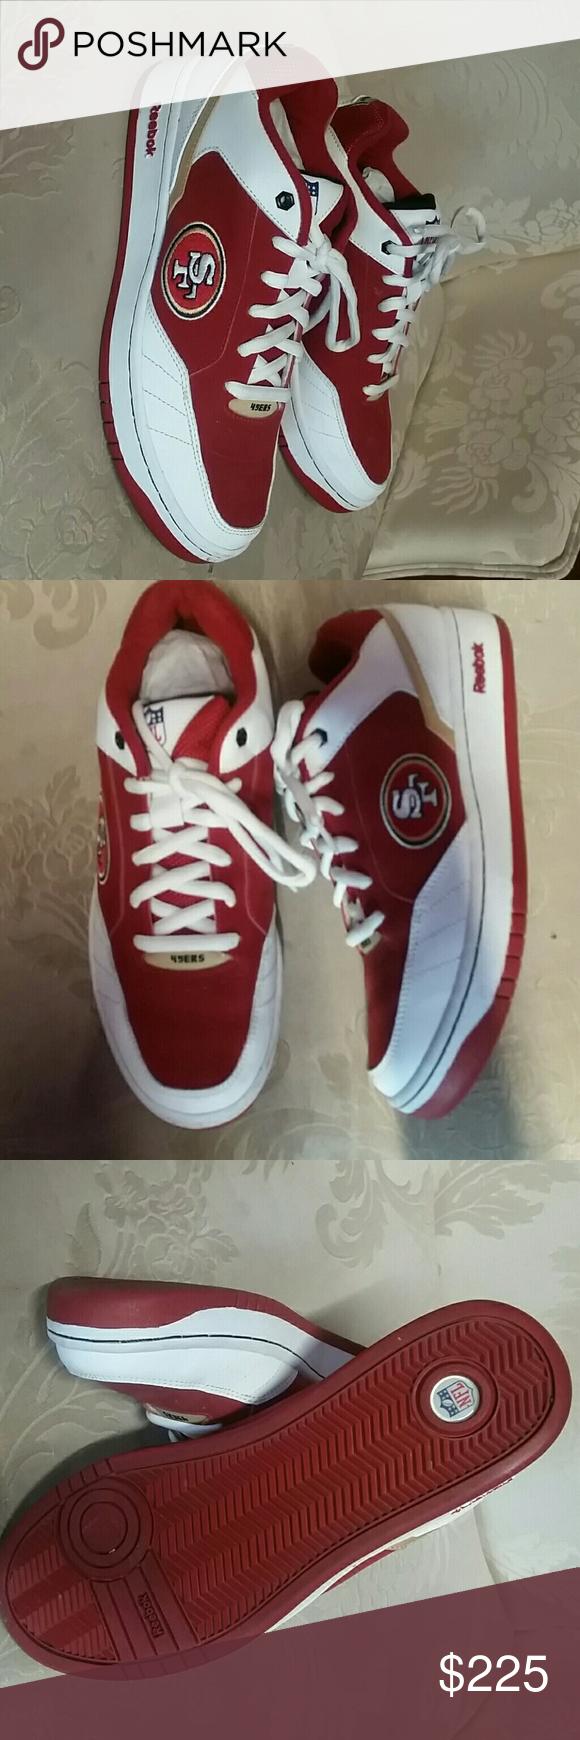 379be35c8397 Men s Rare Reebok NFL 49er s Sneakers